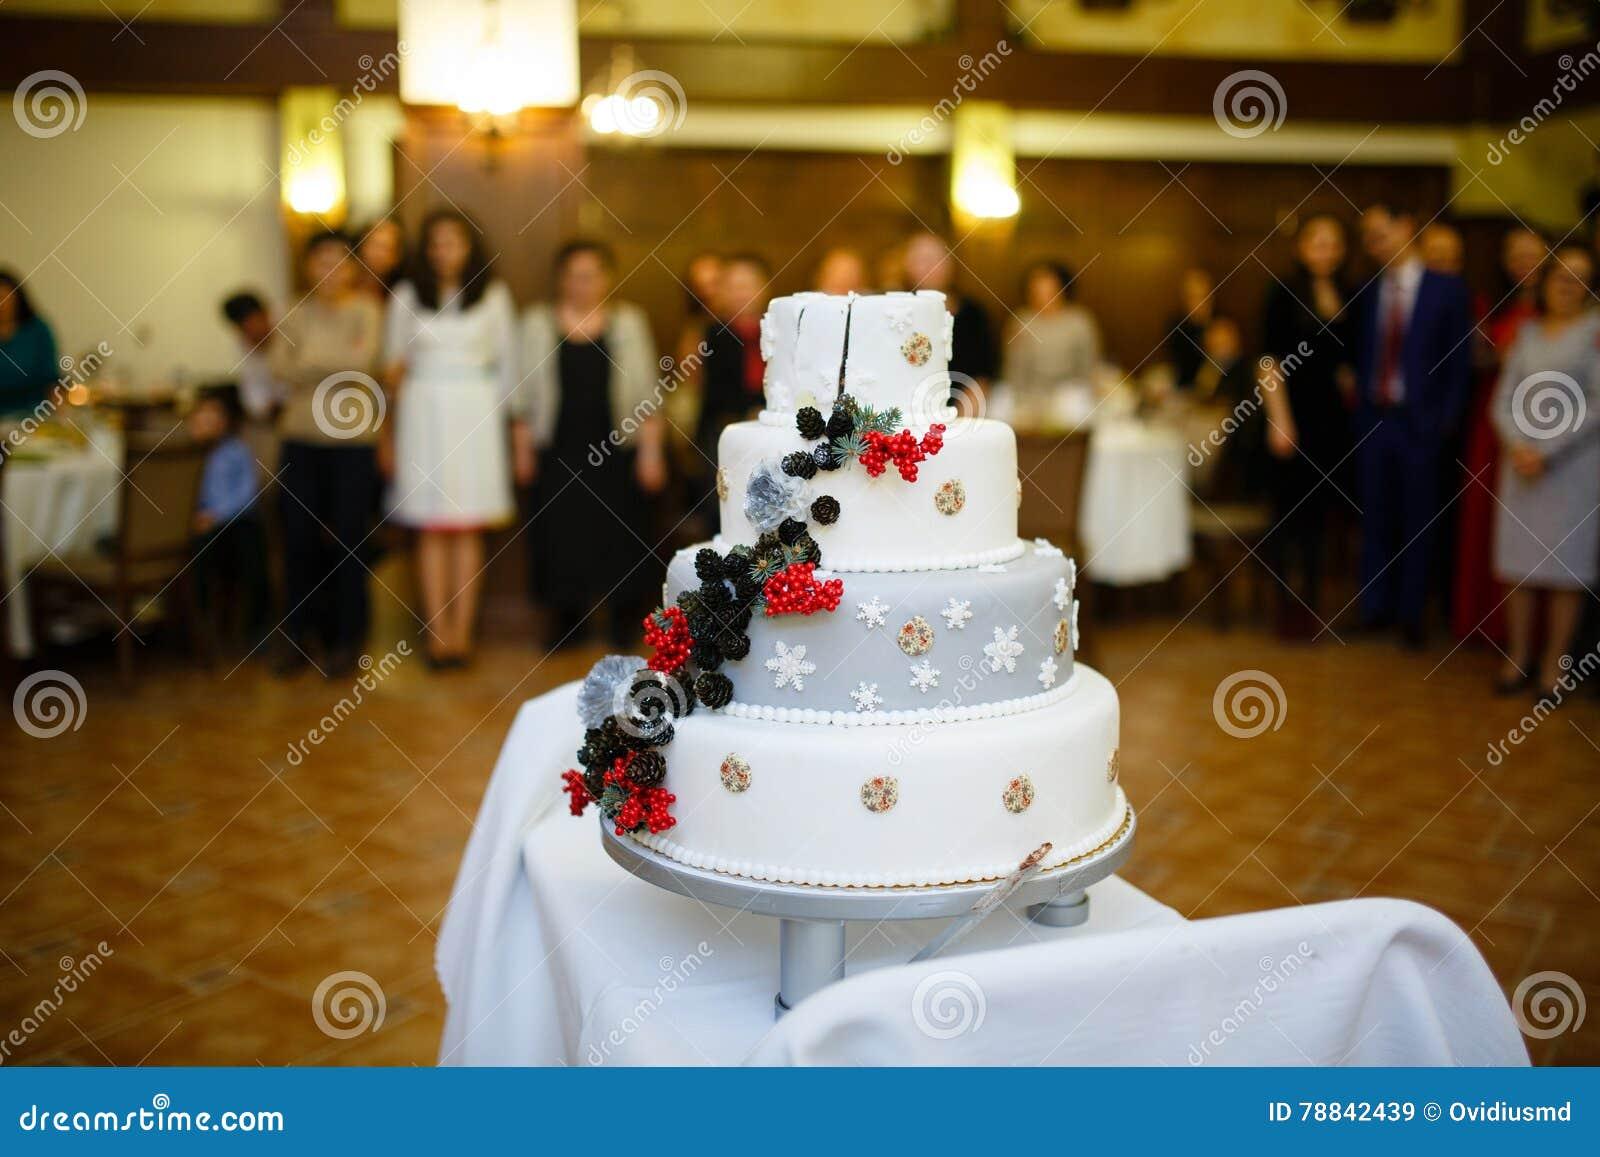 Winter themed wedding cake stock image. Image of berries - 78842439